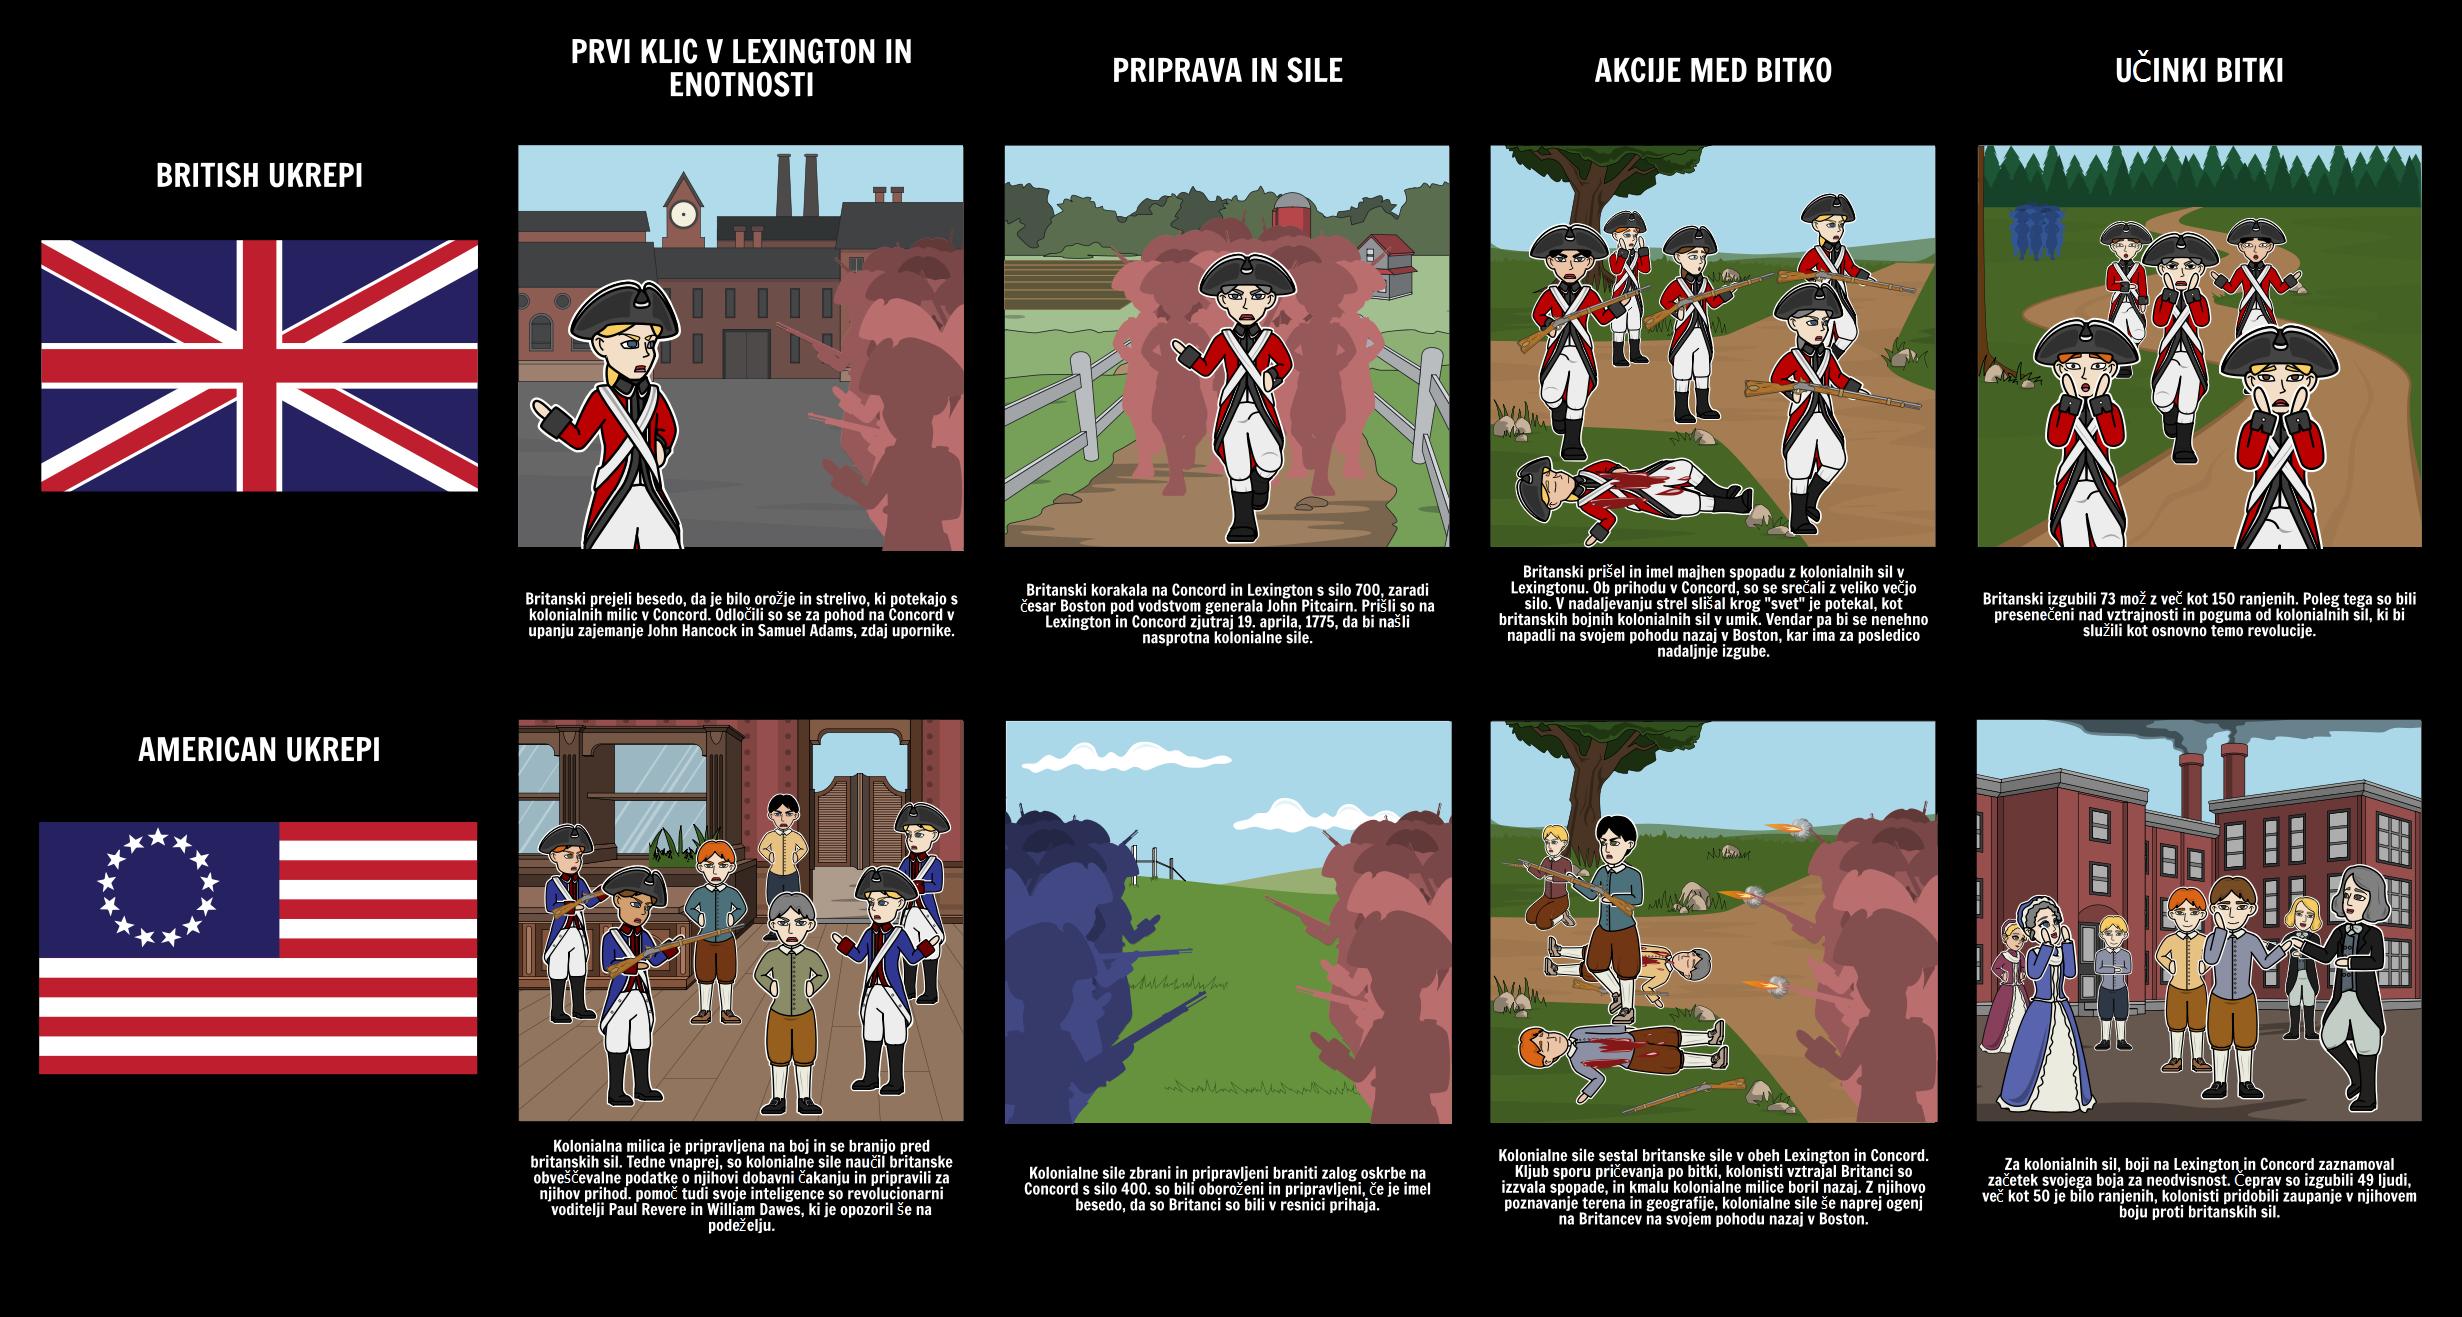 Bitka Lexington in Concord